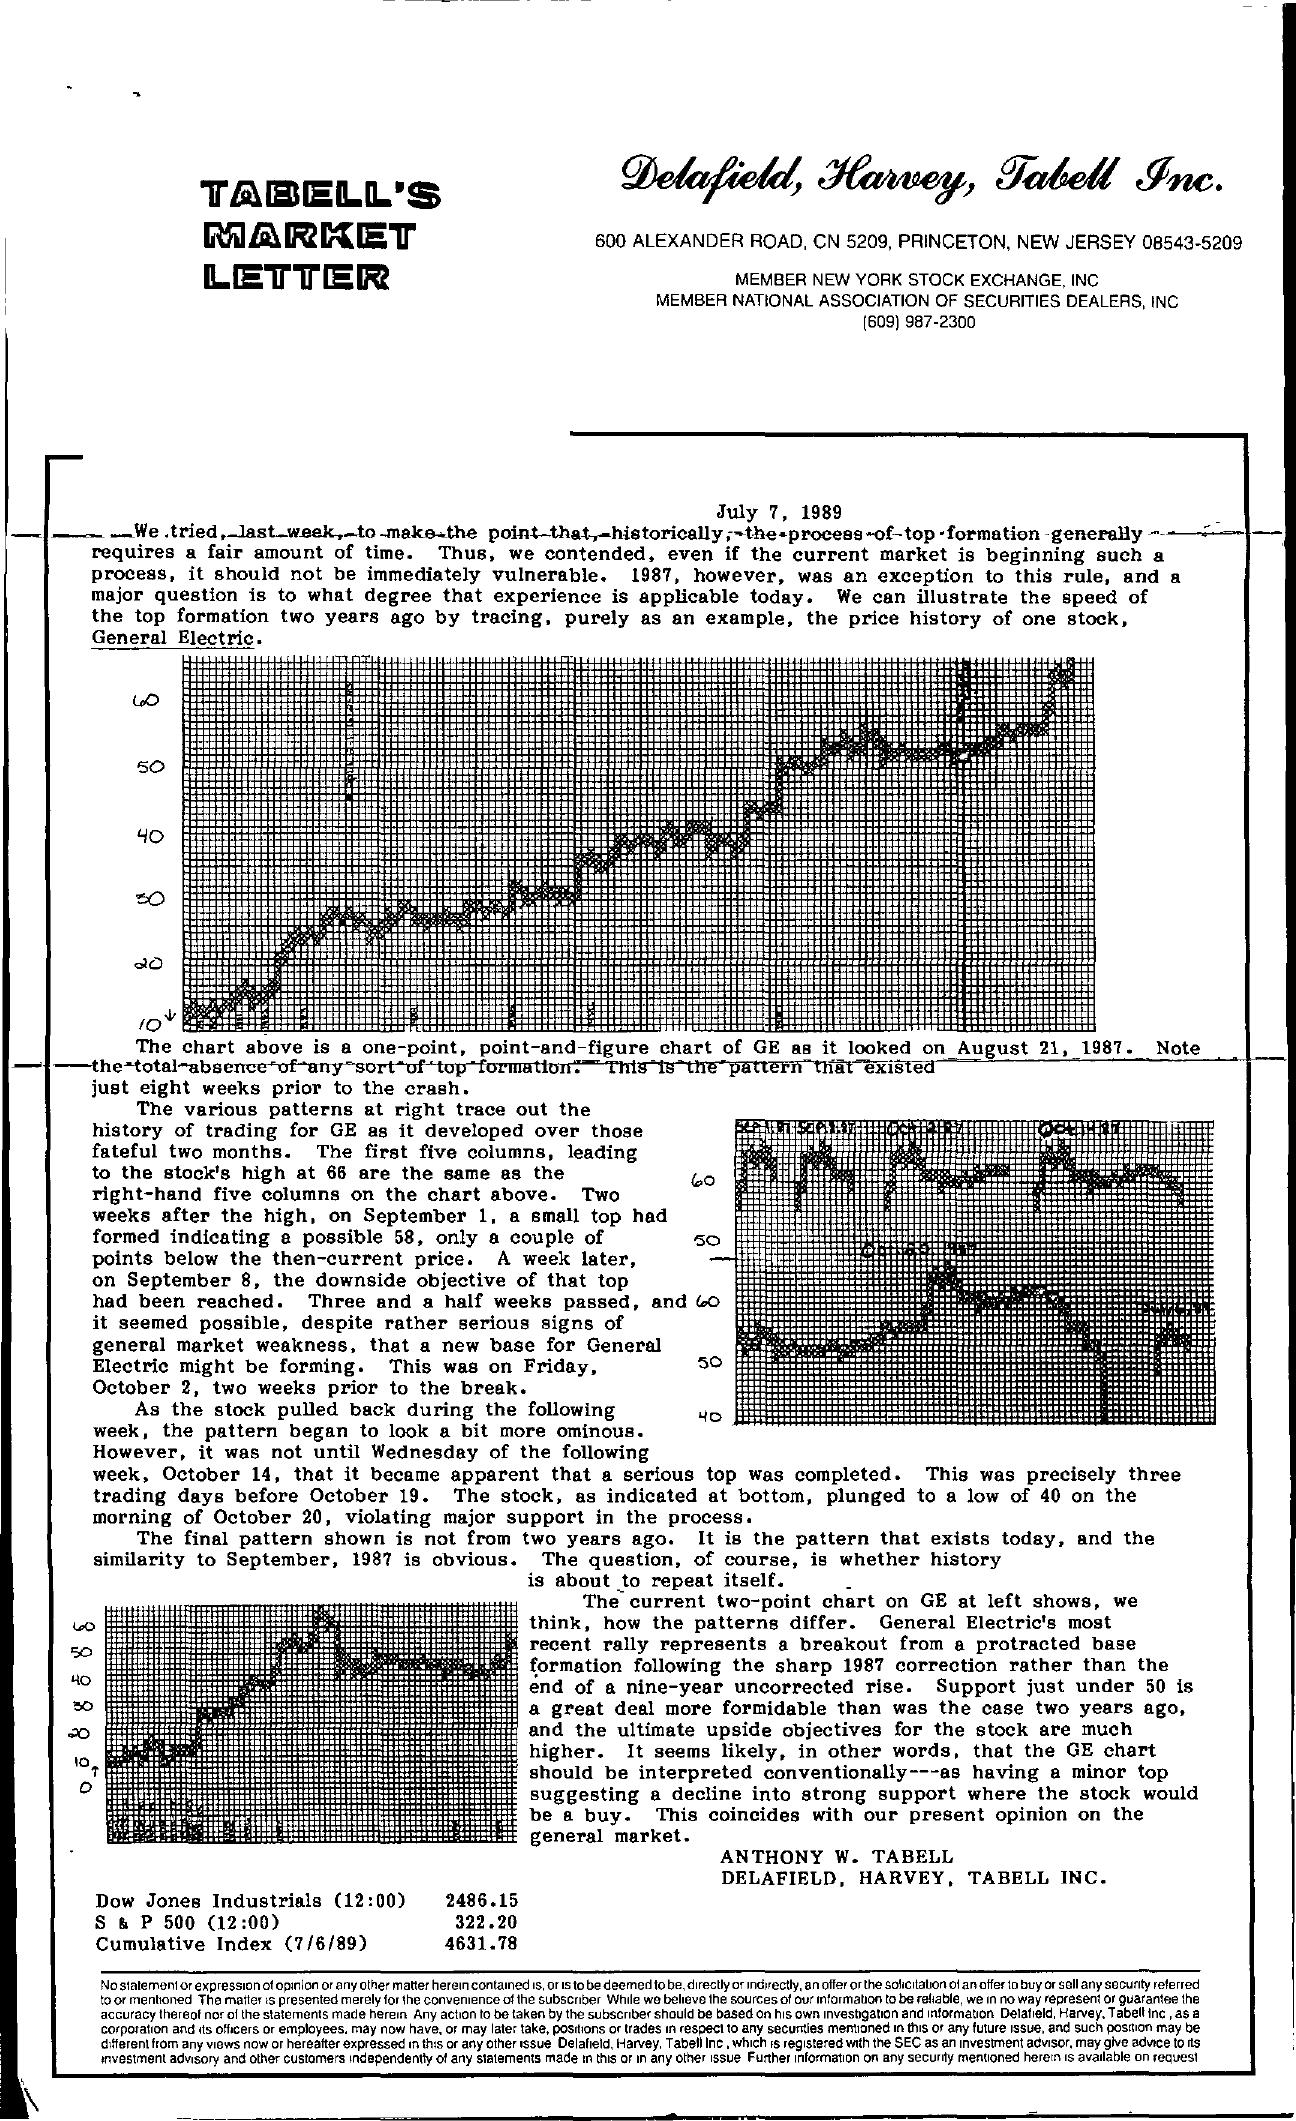 Tabell's Market Letter - July 07, 1989